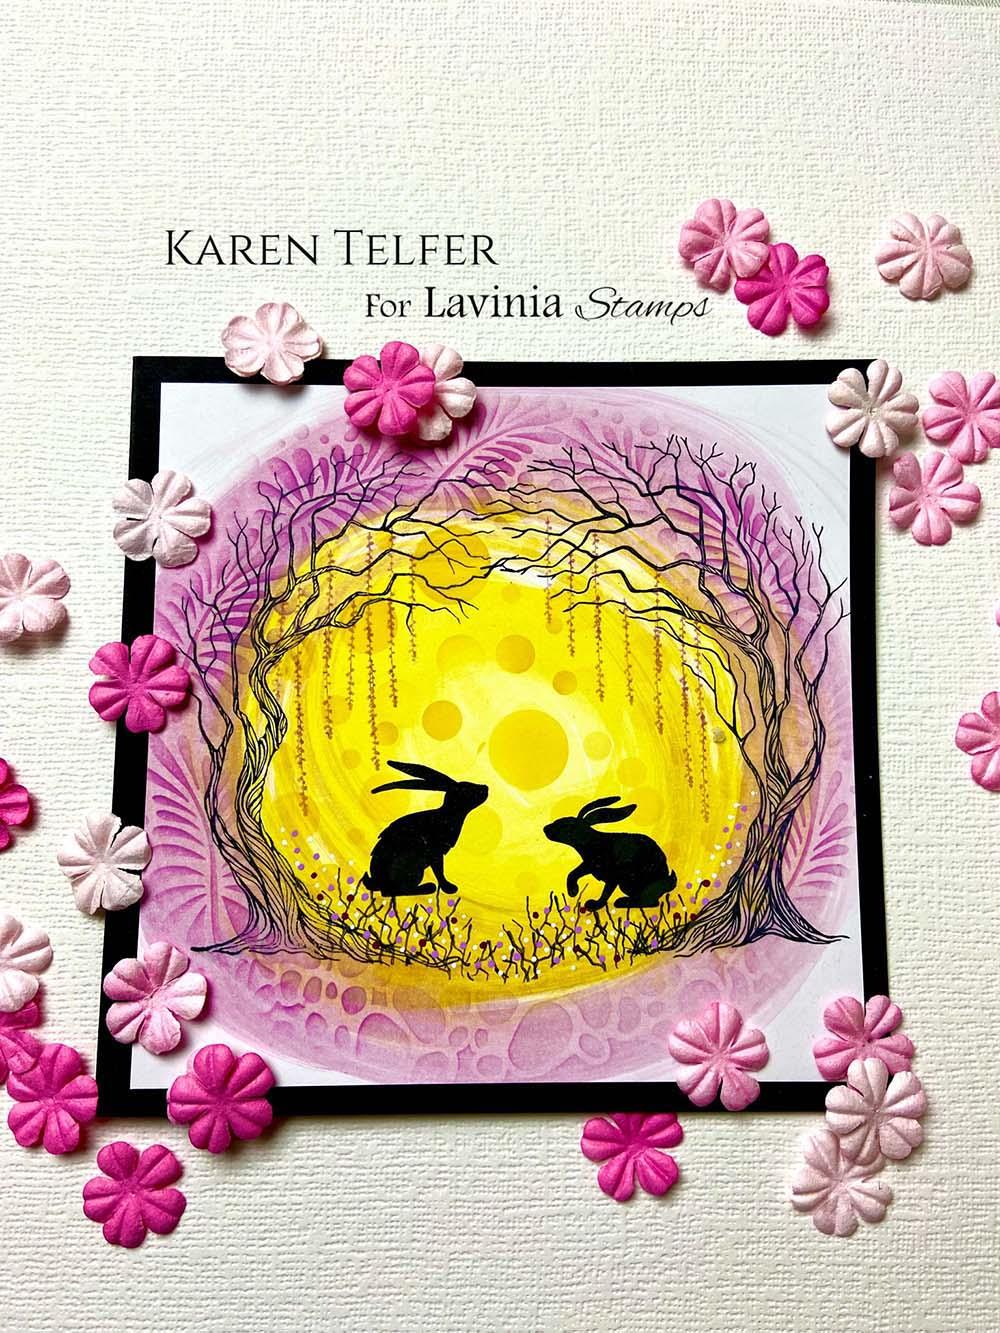 Karen Telfer - A75E052B-9344-40AA-84CC-505F8D951E37 copy